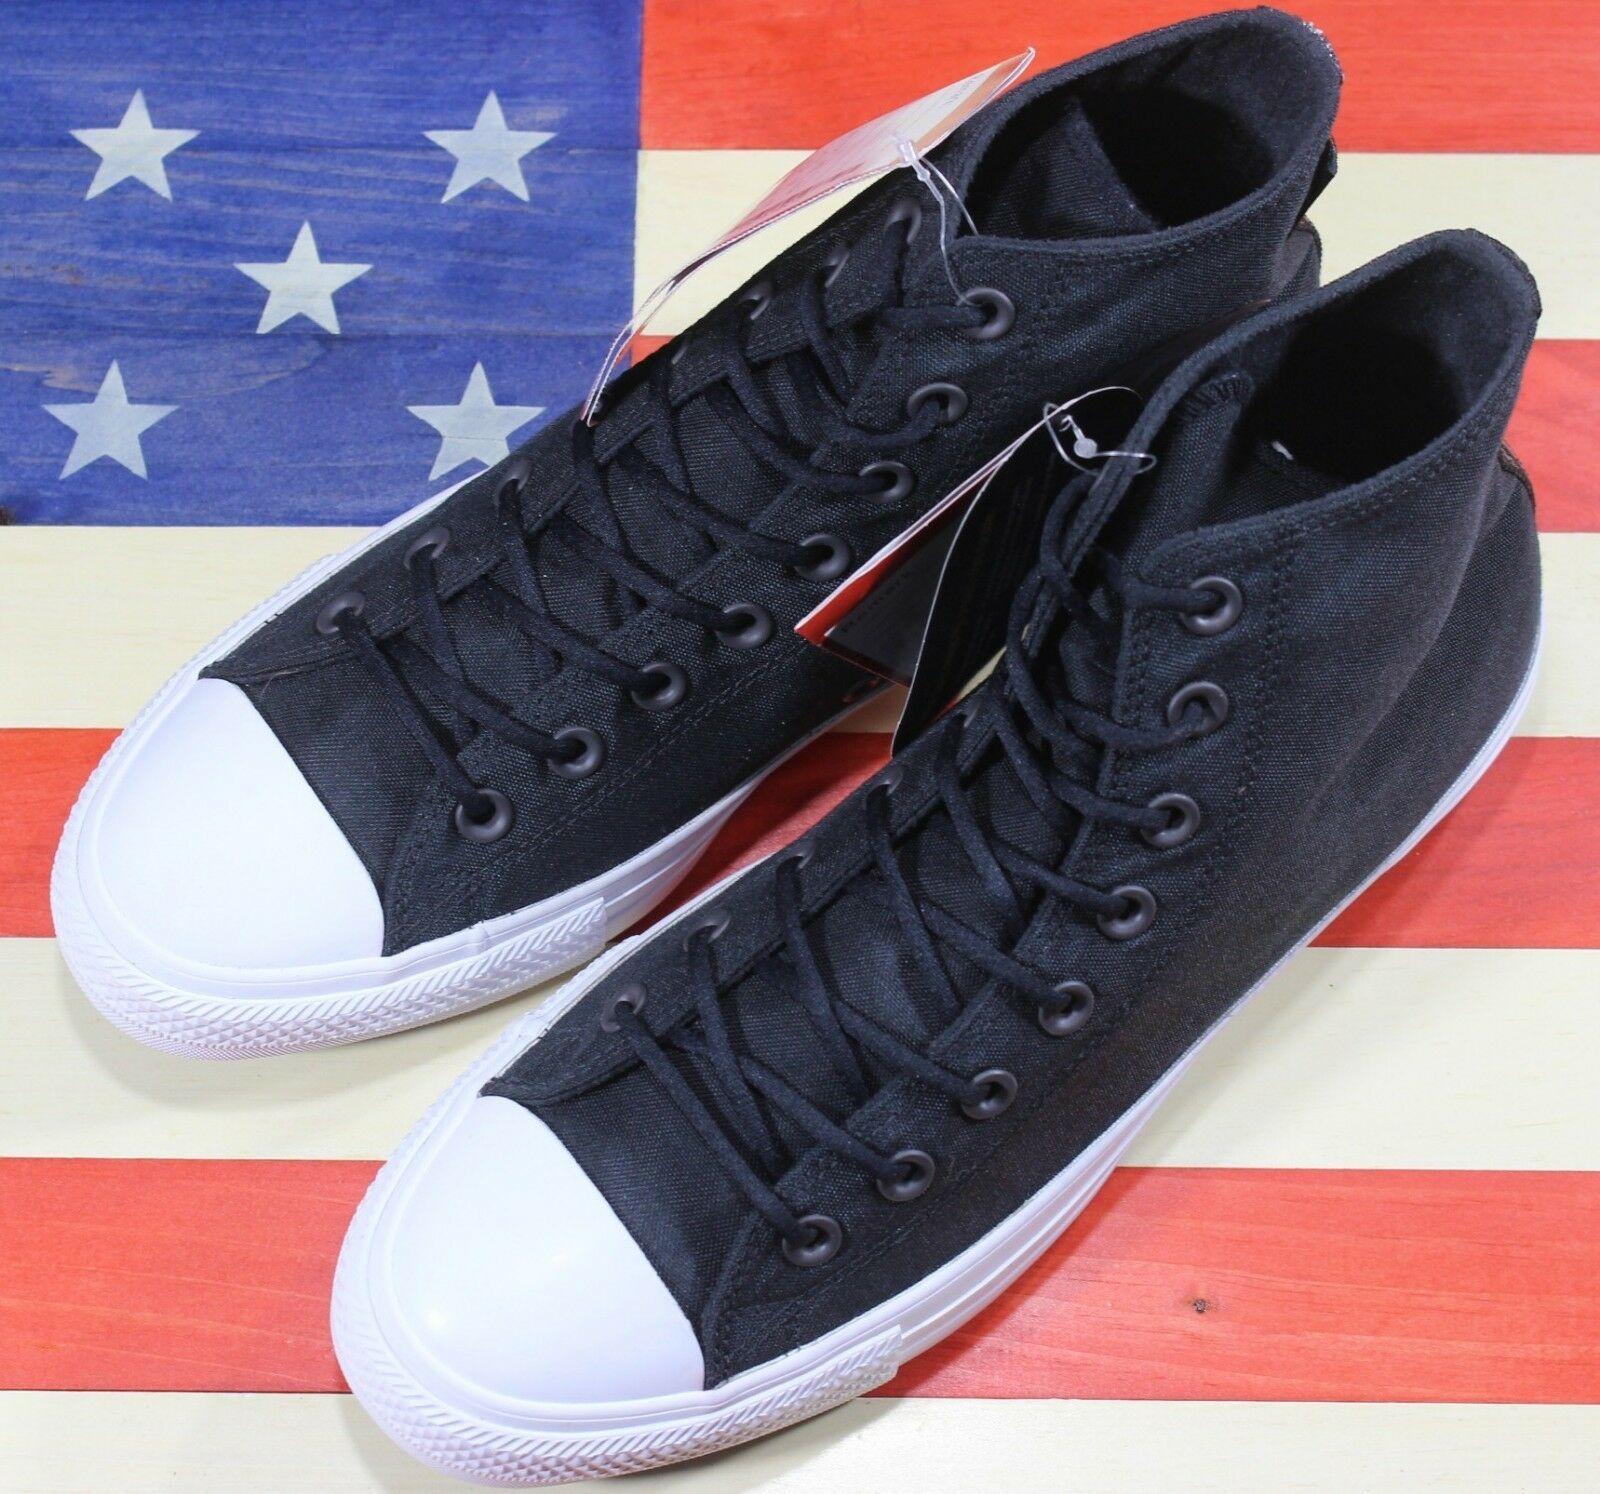 CONVERSE SAMPLE Chuck Taylor ALL-STAR HI Cordura Black White Shoe [157516C] sz 9 image 9